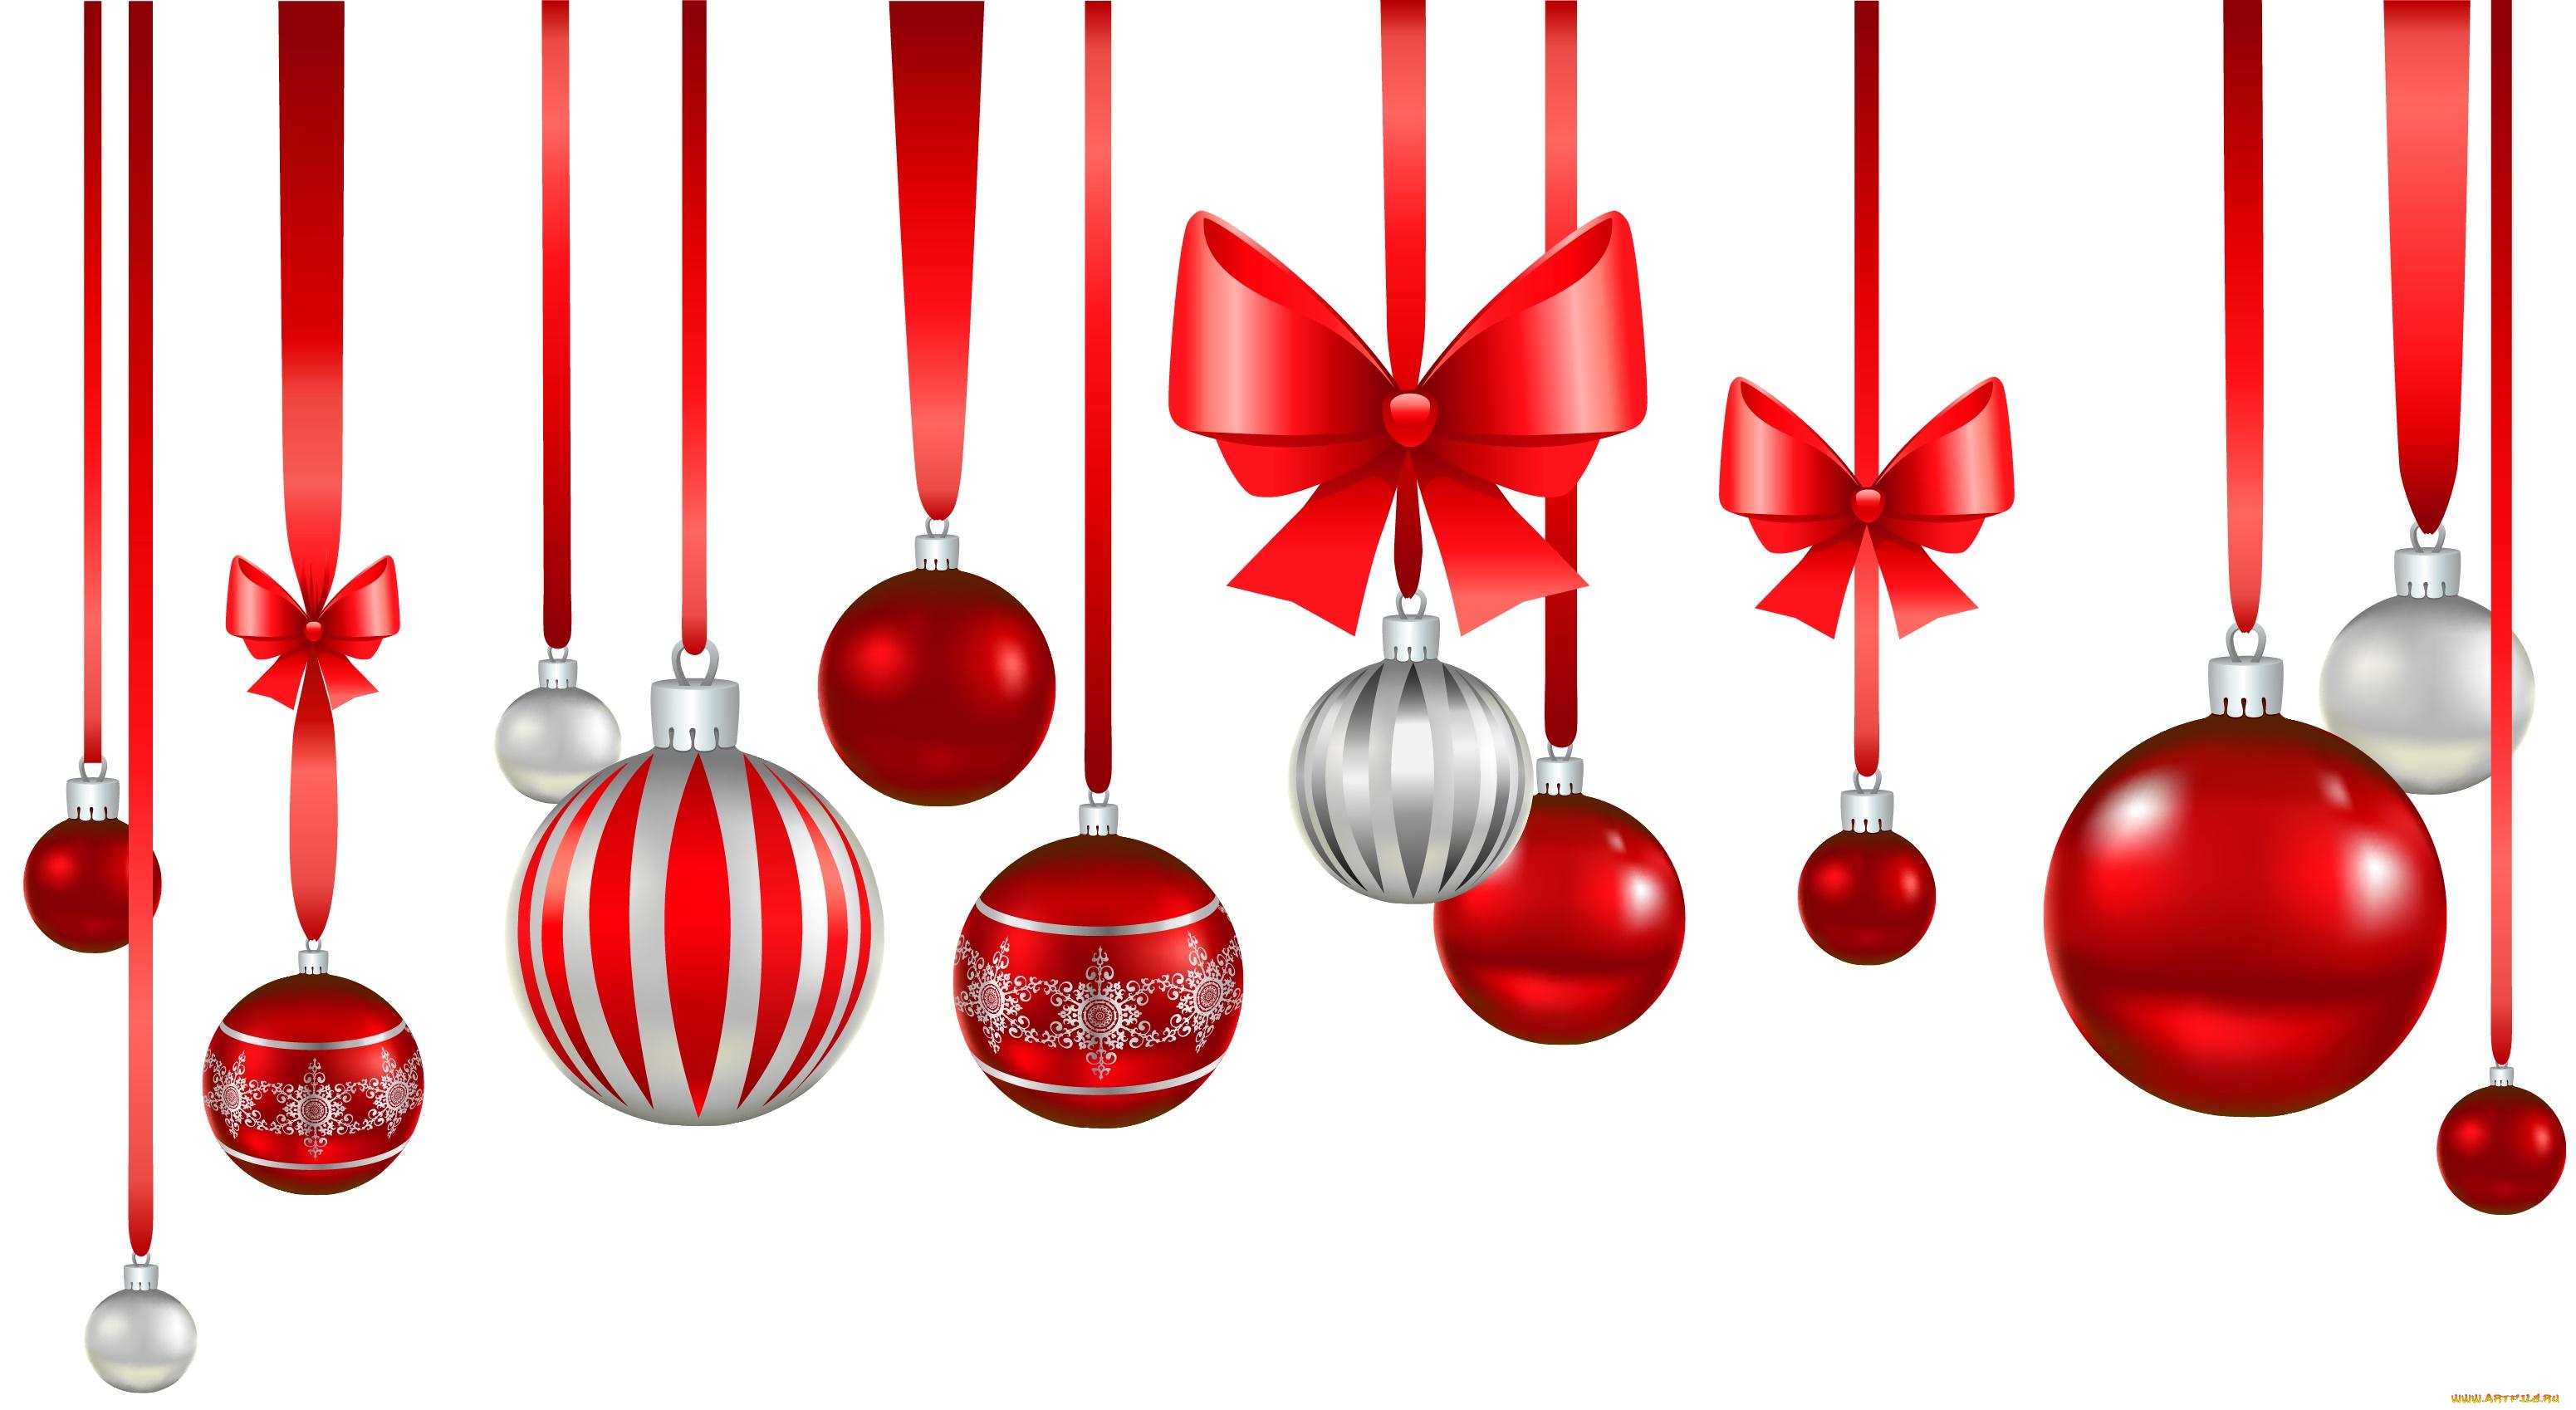 Картинки новогодних украшений без фона